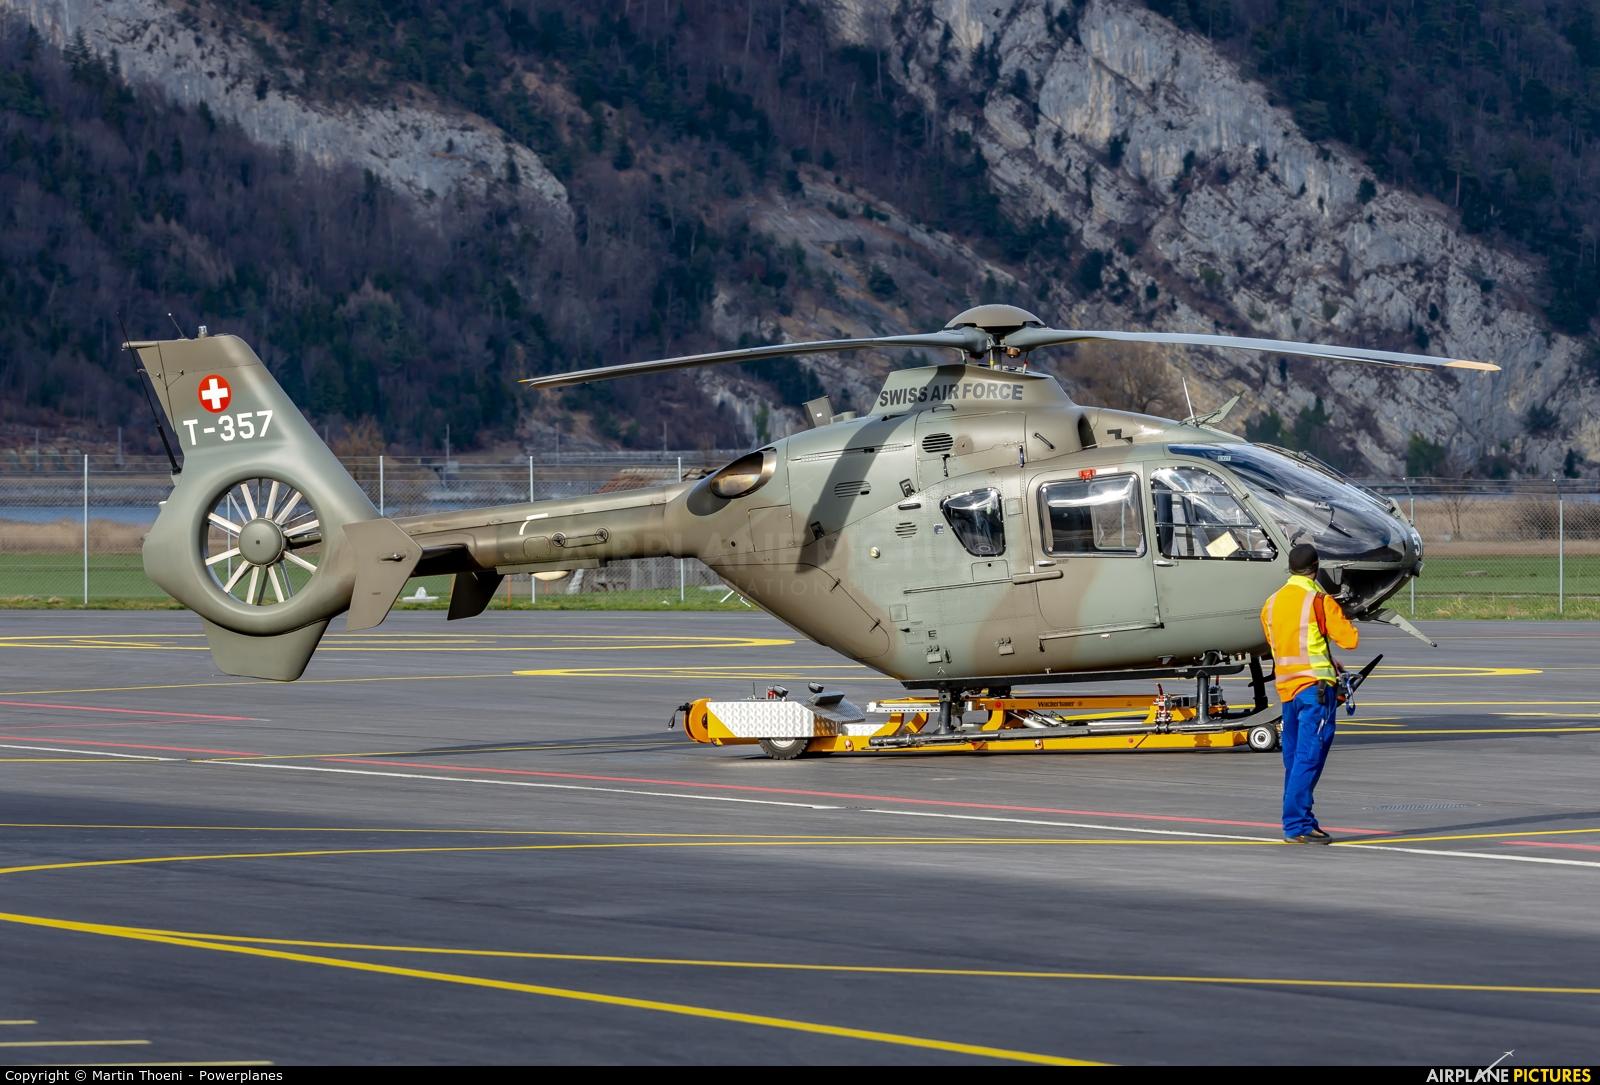 Switzerland - Air Force T-357 aircraft at Alpnach